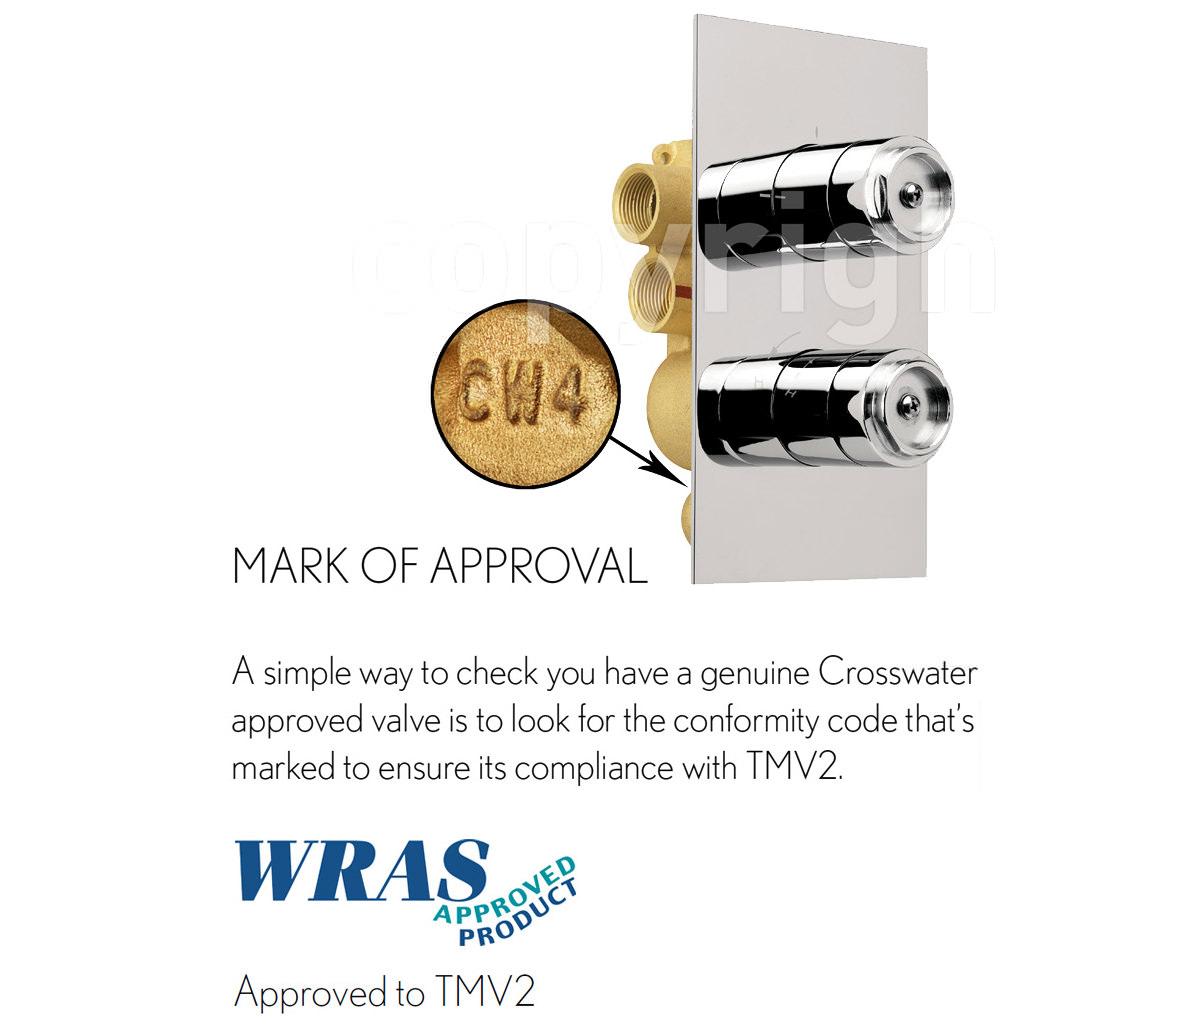 2 way vs 3 valve rj11 to rj45 pinout diagram crosswater water square slim shower with